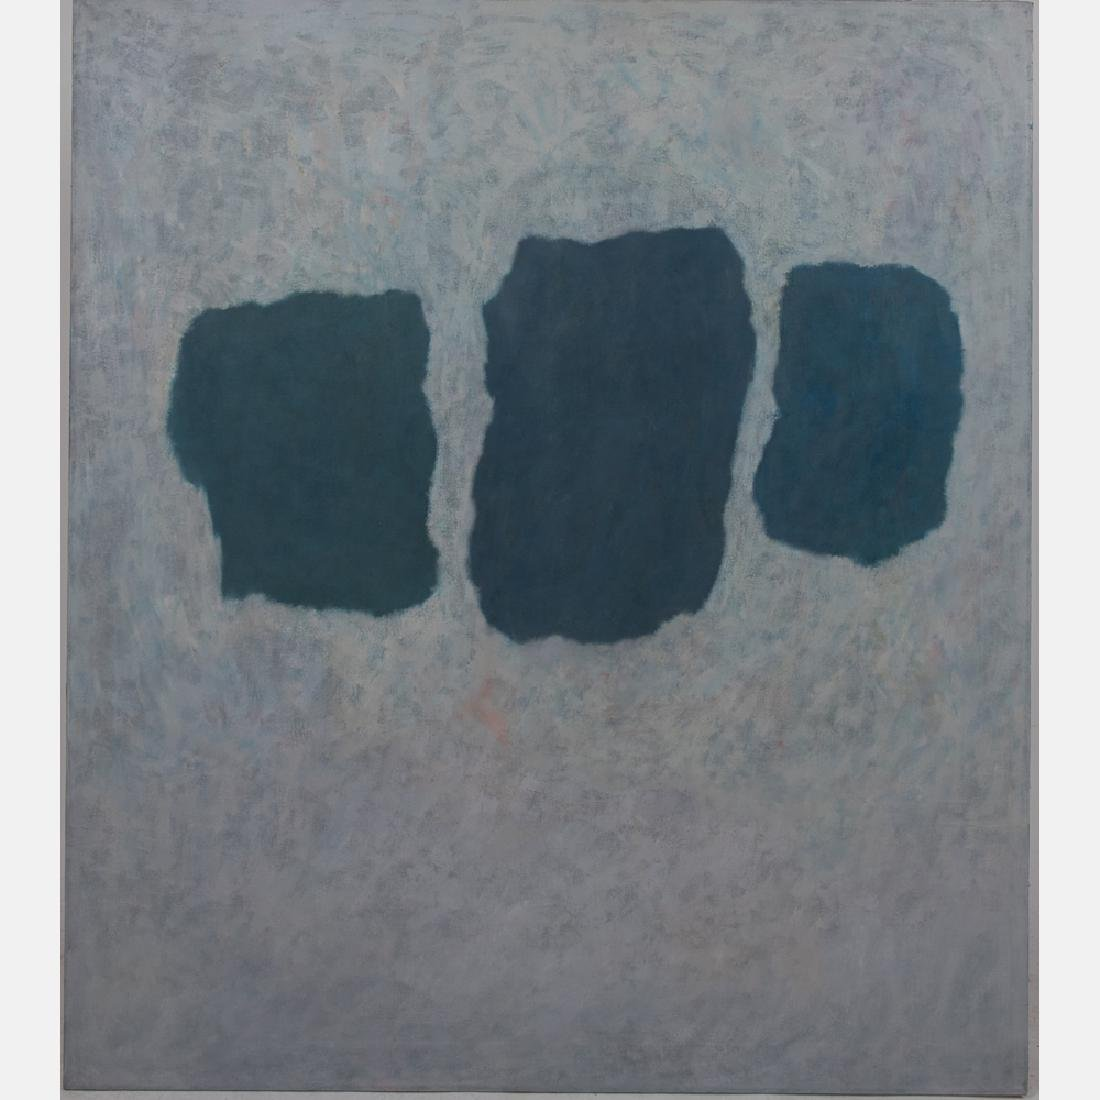 Al Newbill (1921-2012) The Trinity, Oil on canvas,